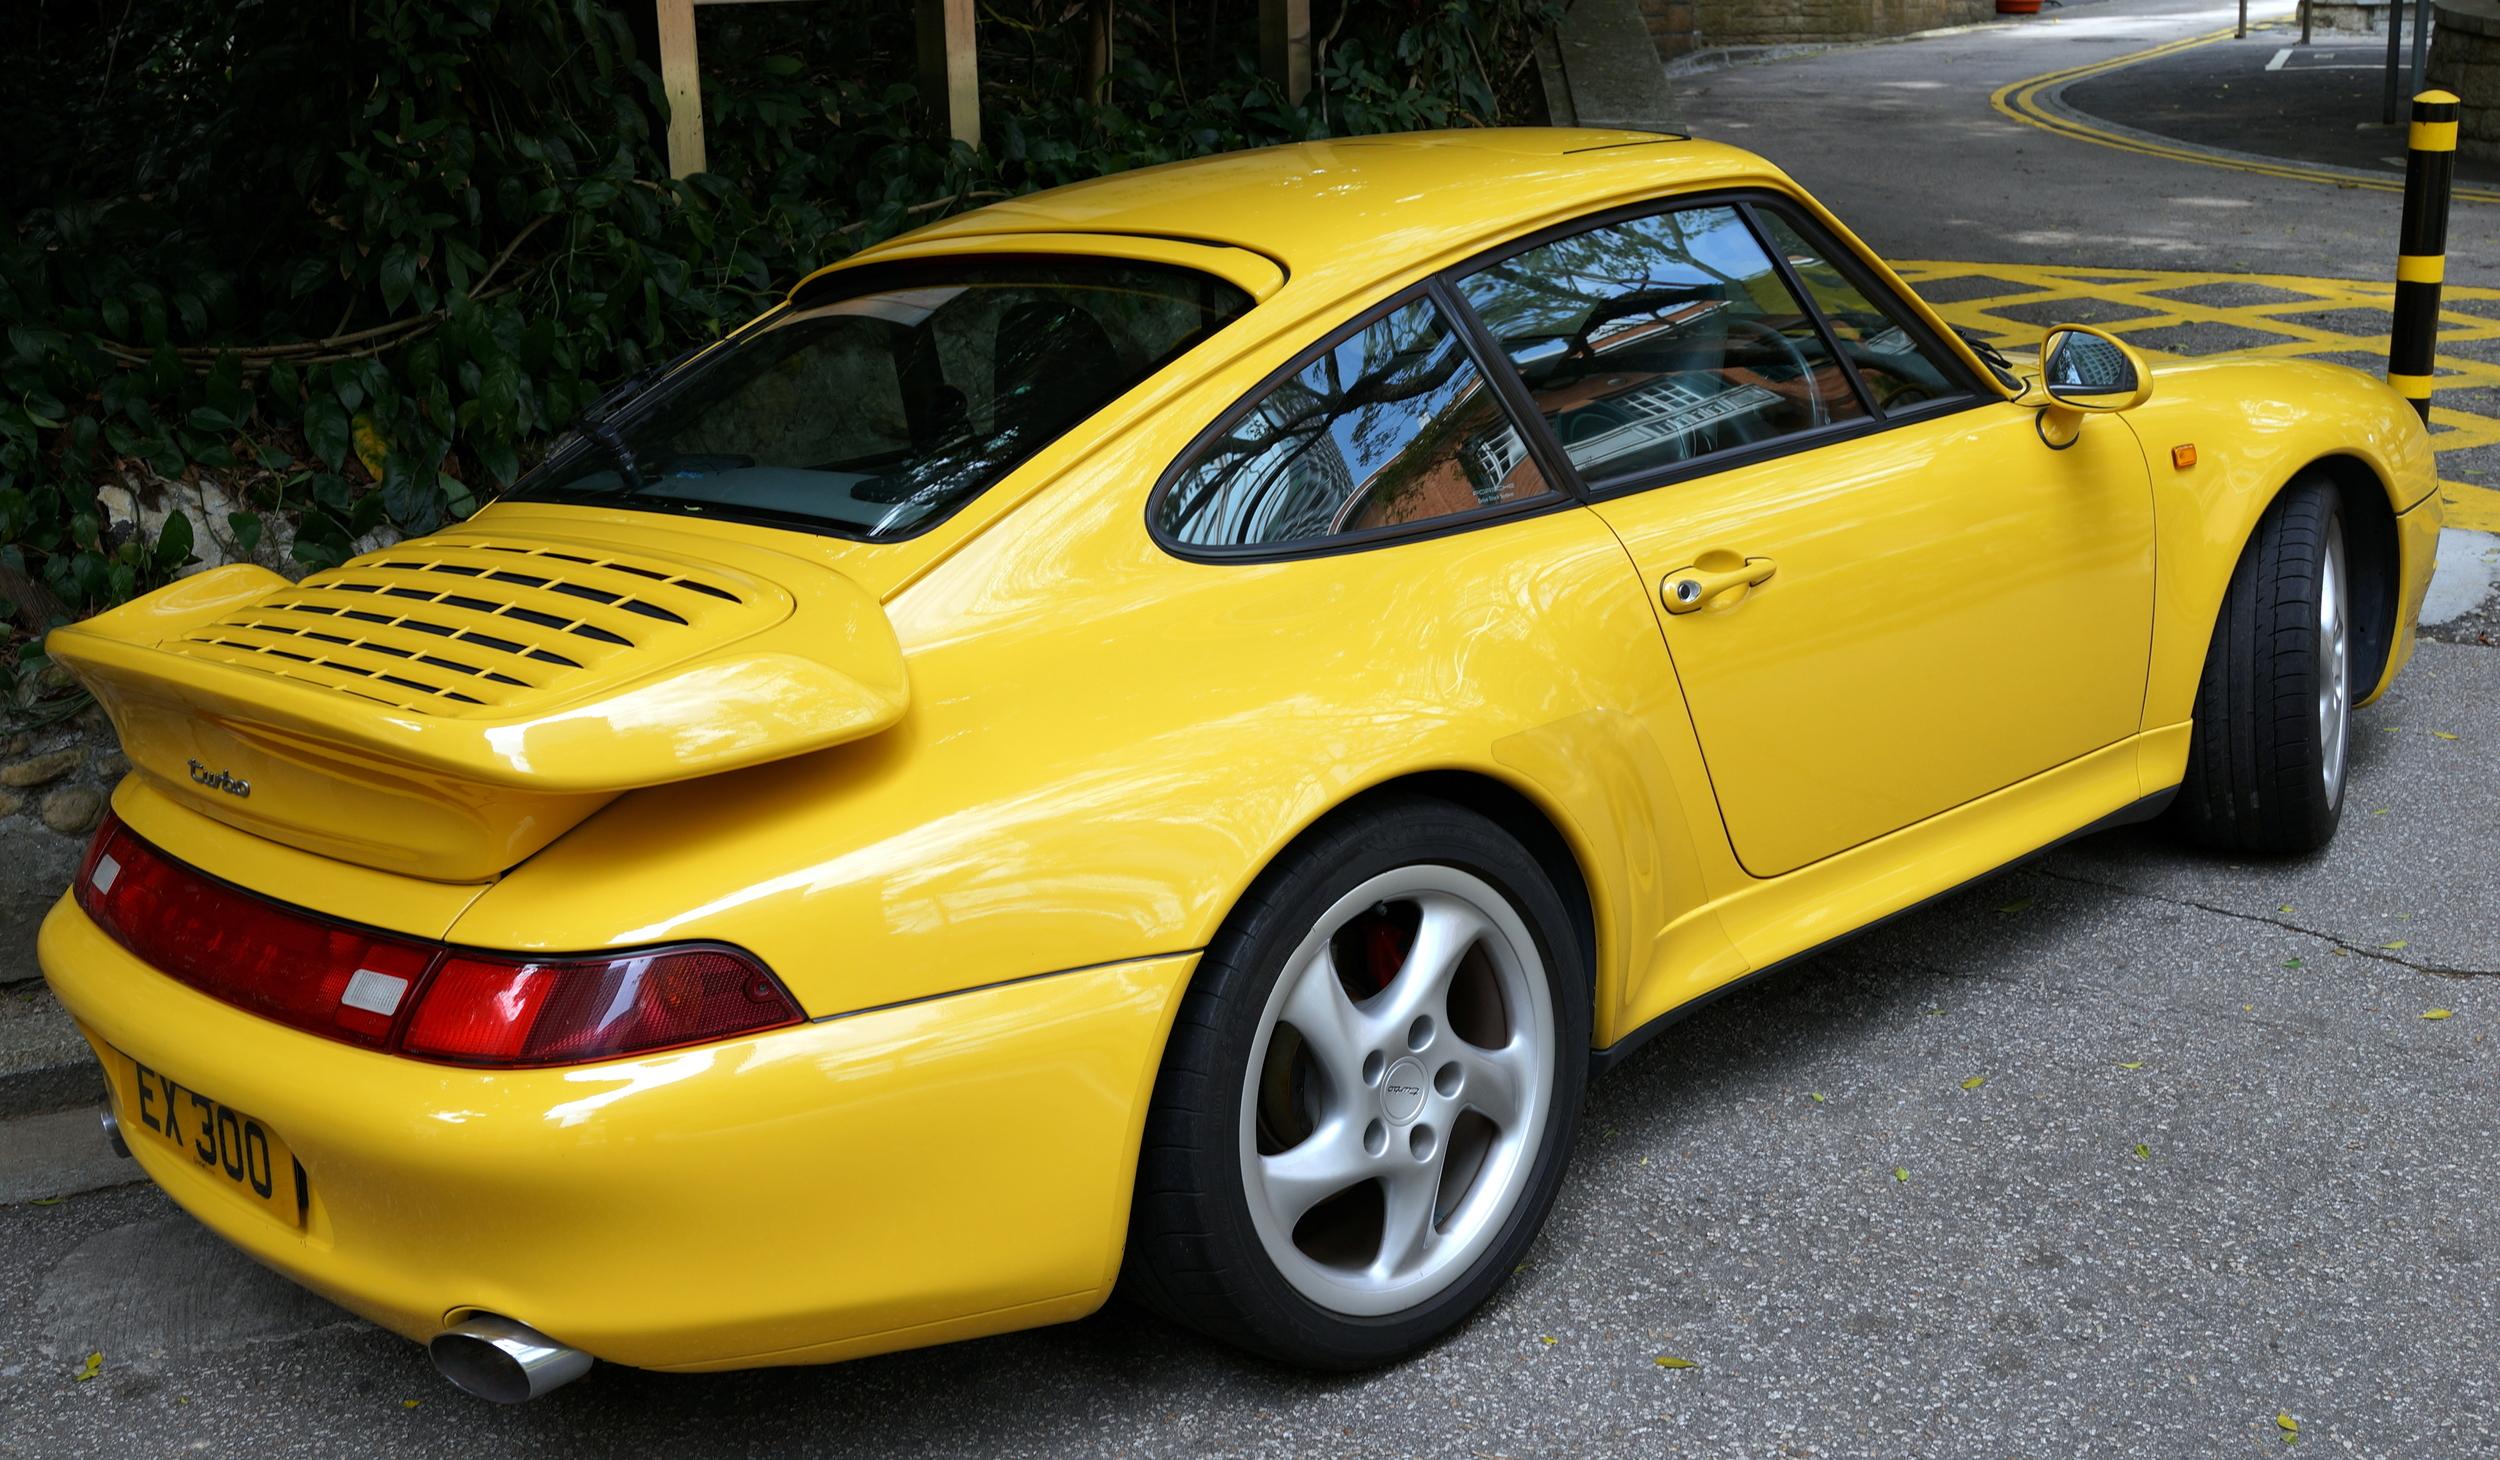 An old Porsche Turbo